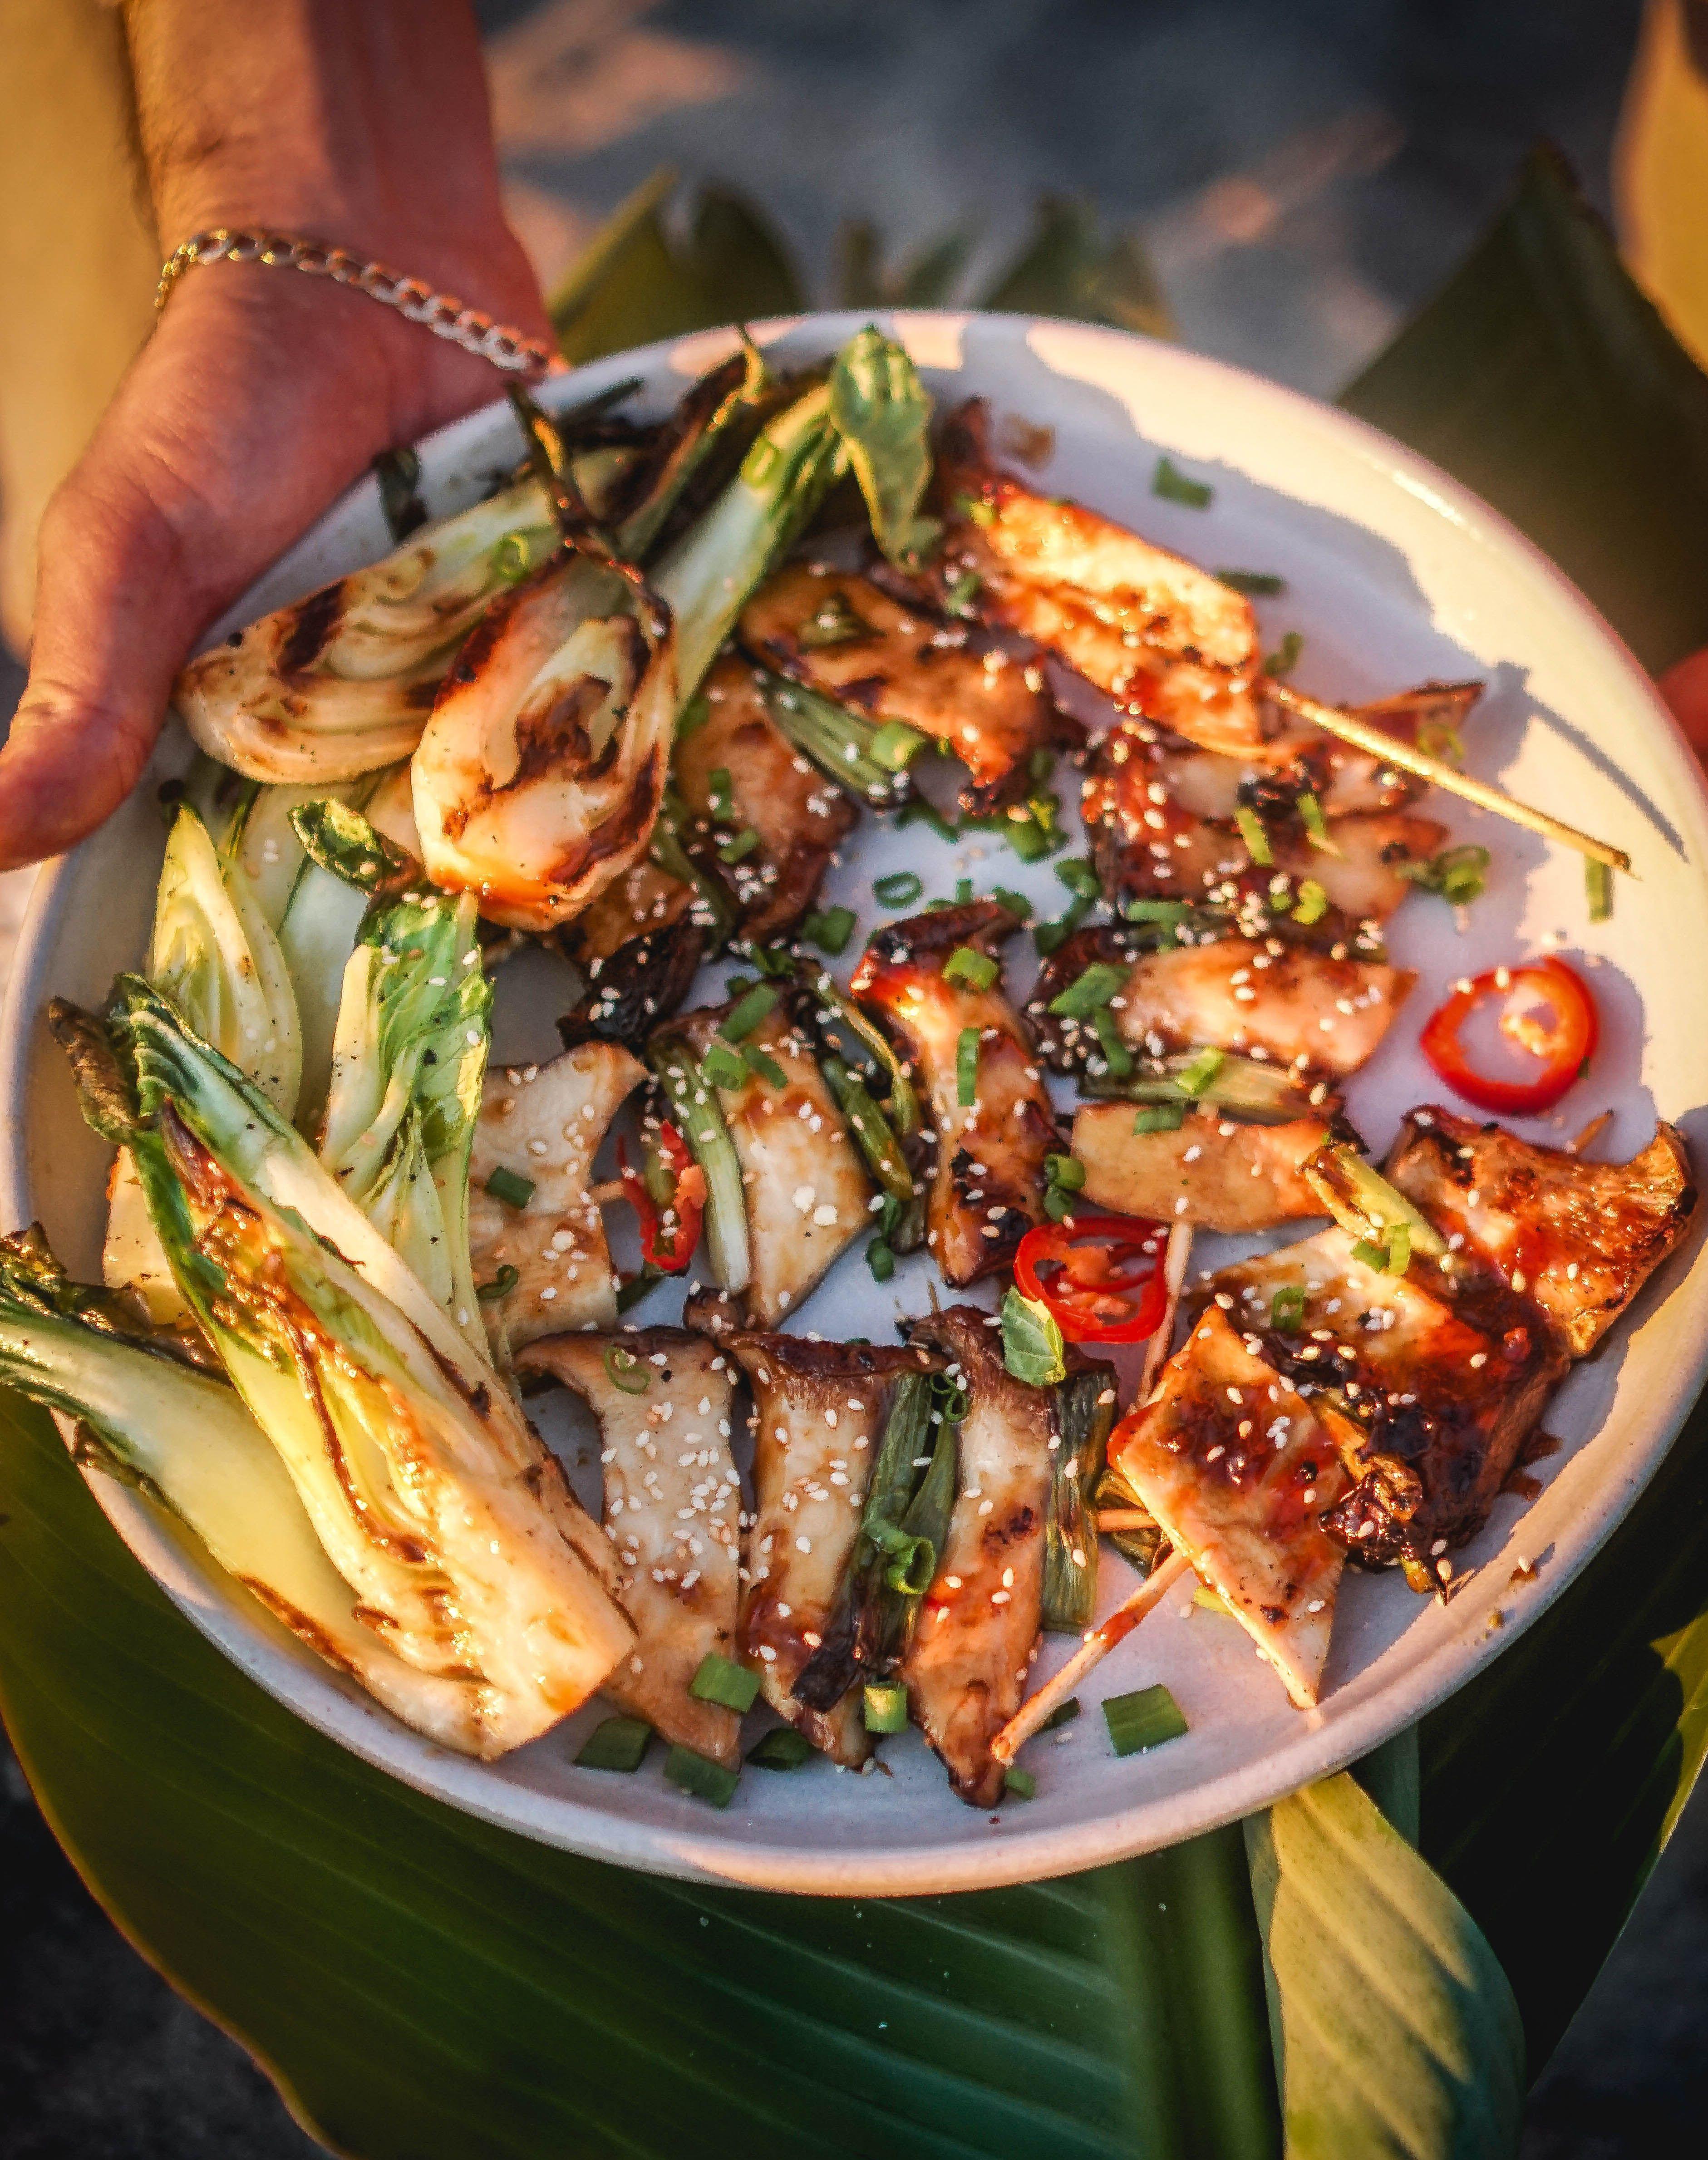 VEGAN YAKITORI. Meaty king oyster mushroom yakitori! The